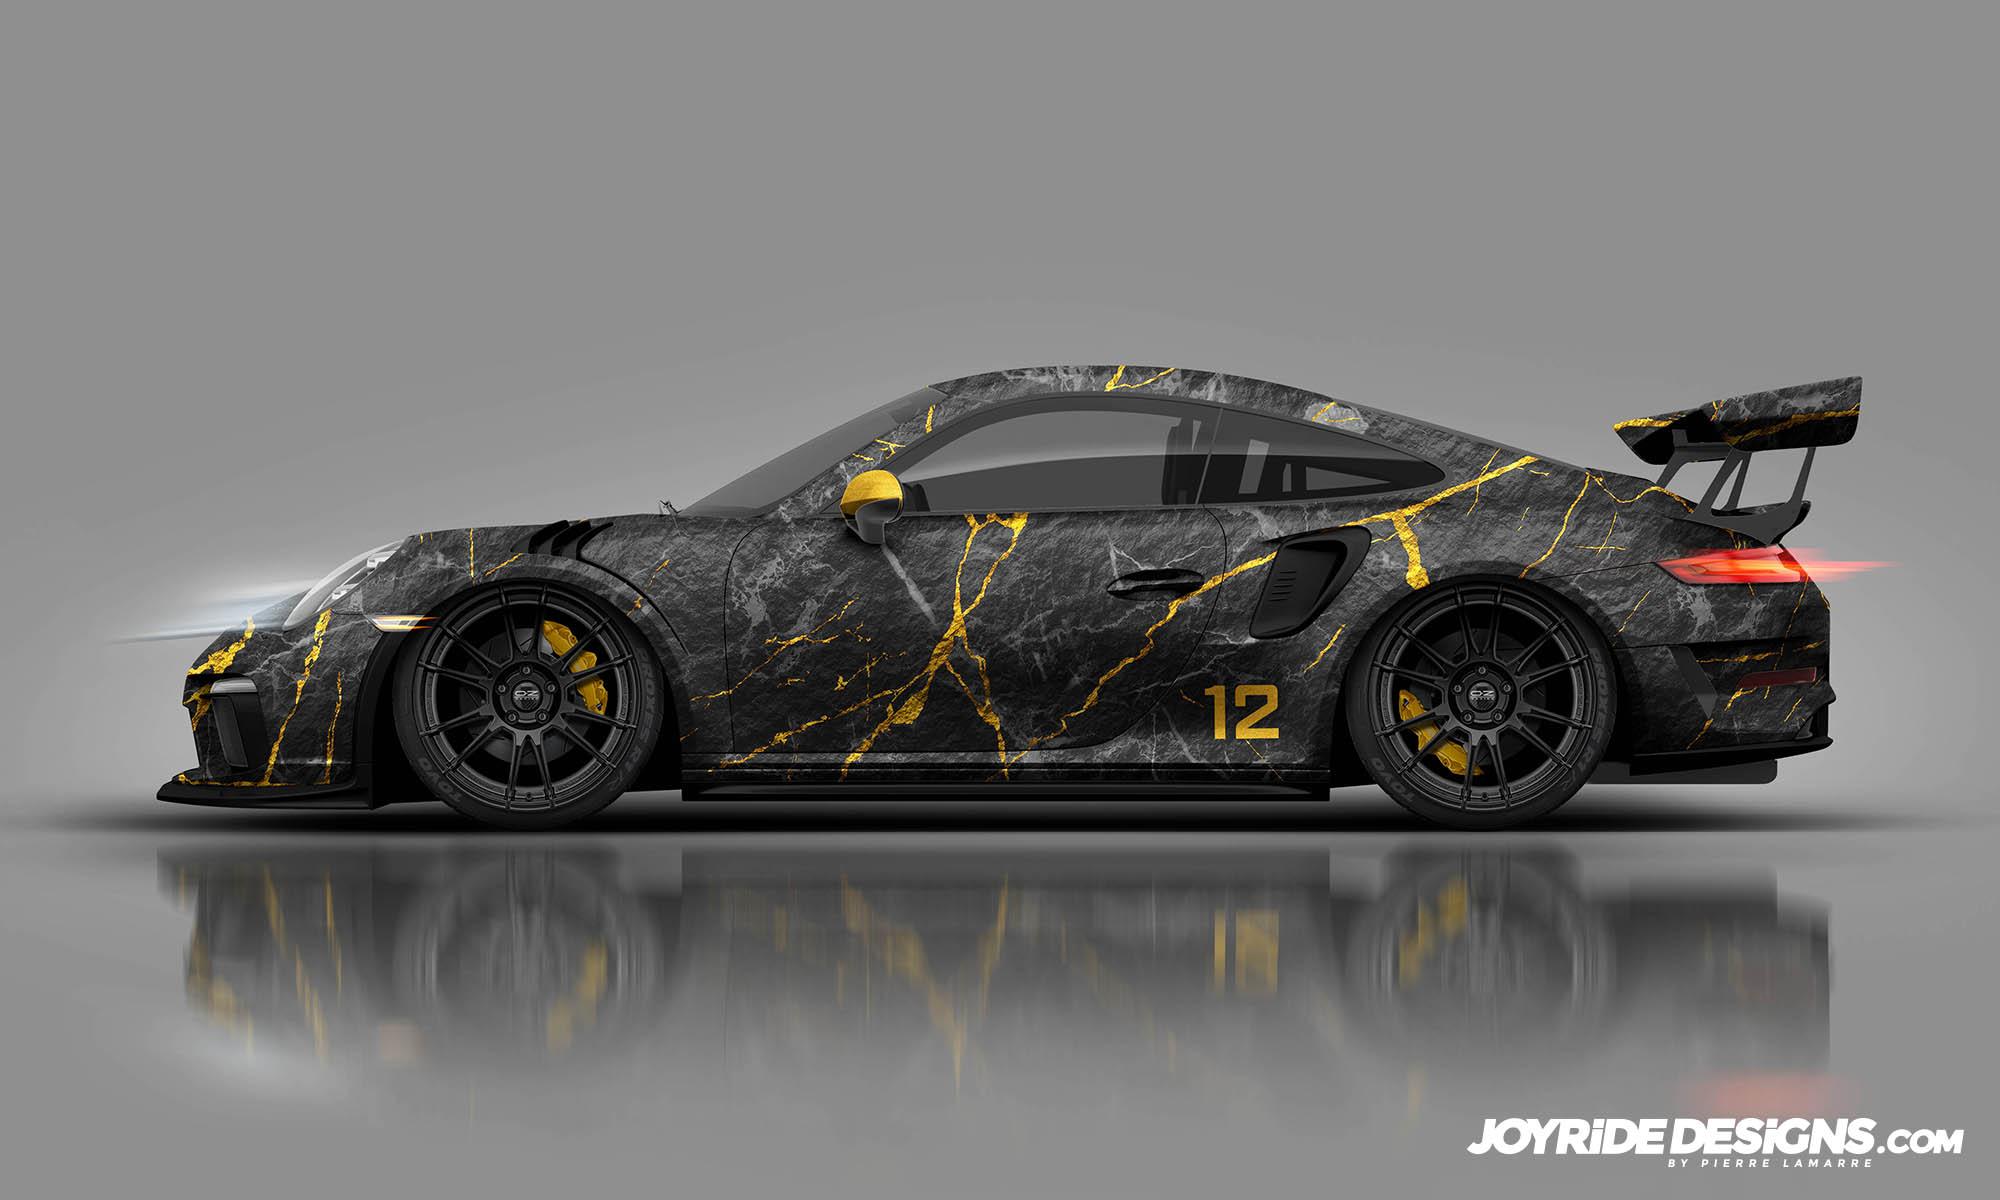 PORSCHE GT3RS BLACK AND GOLD MARBLE JOYRIDE WRAP DESIGN